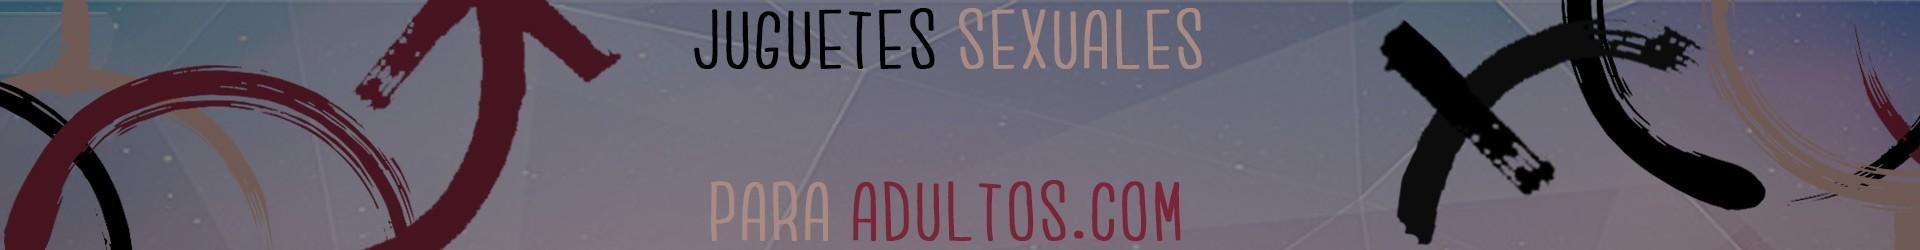 Vagina virgen - Juguetes Sexuales para Adultos